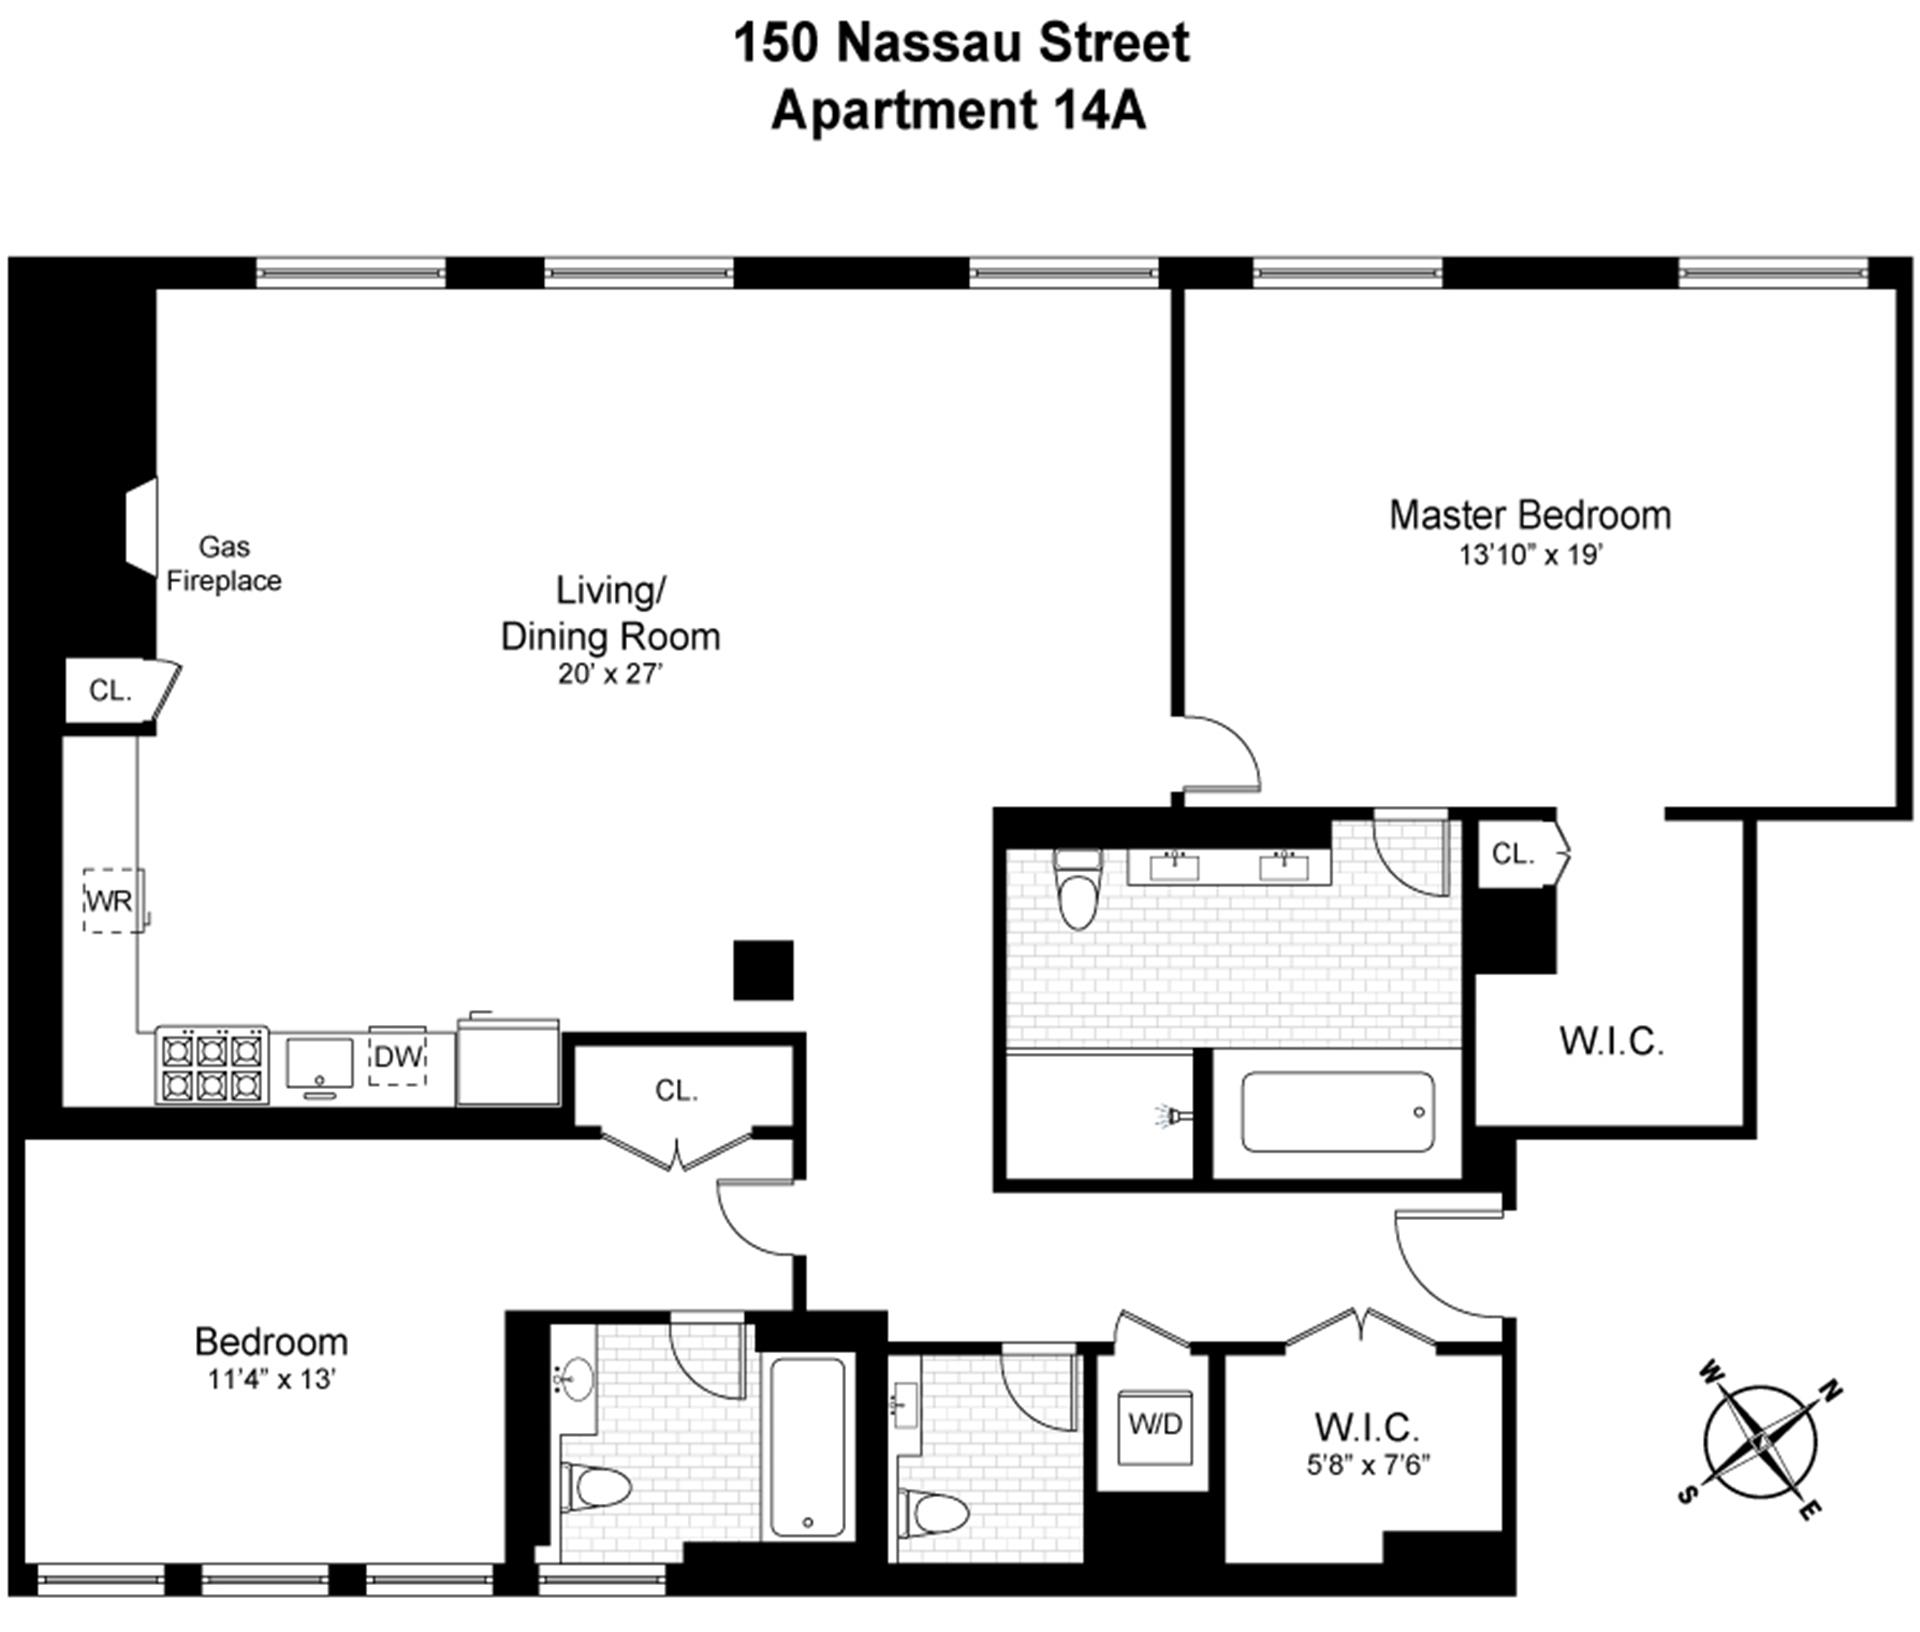 Floor plan of 150 Nassau Street, 14A - Financial District, New York